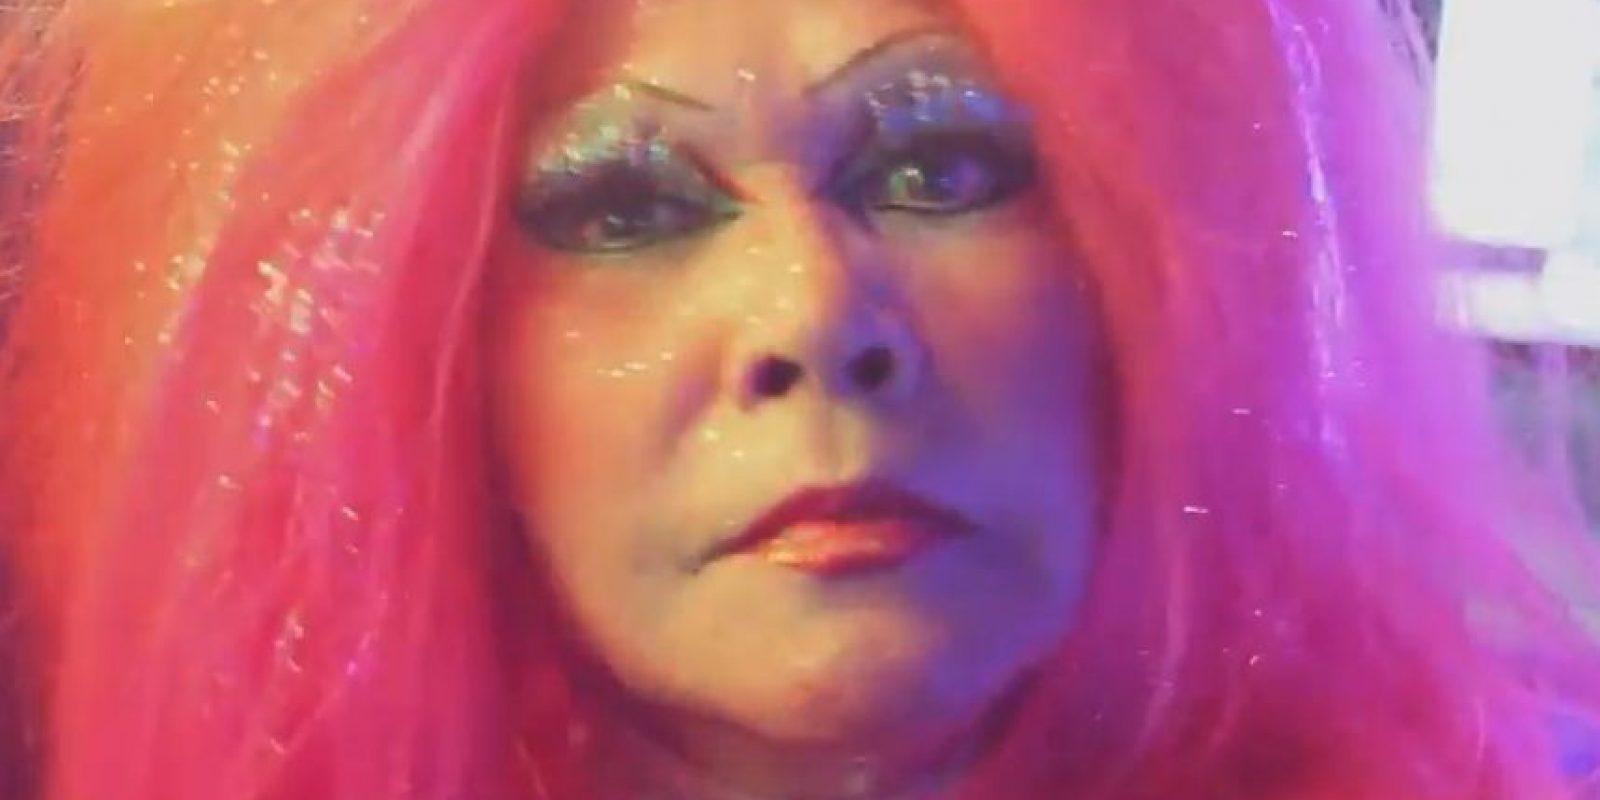 La Tigresa del Oriente vuelve con un homenaje kistch a sí misma Foto:Tigresa del Oriente/ Youtube